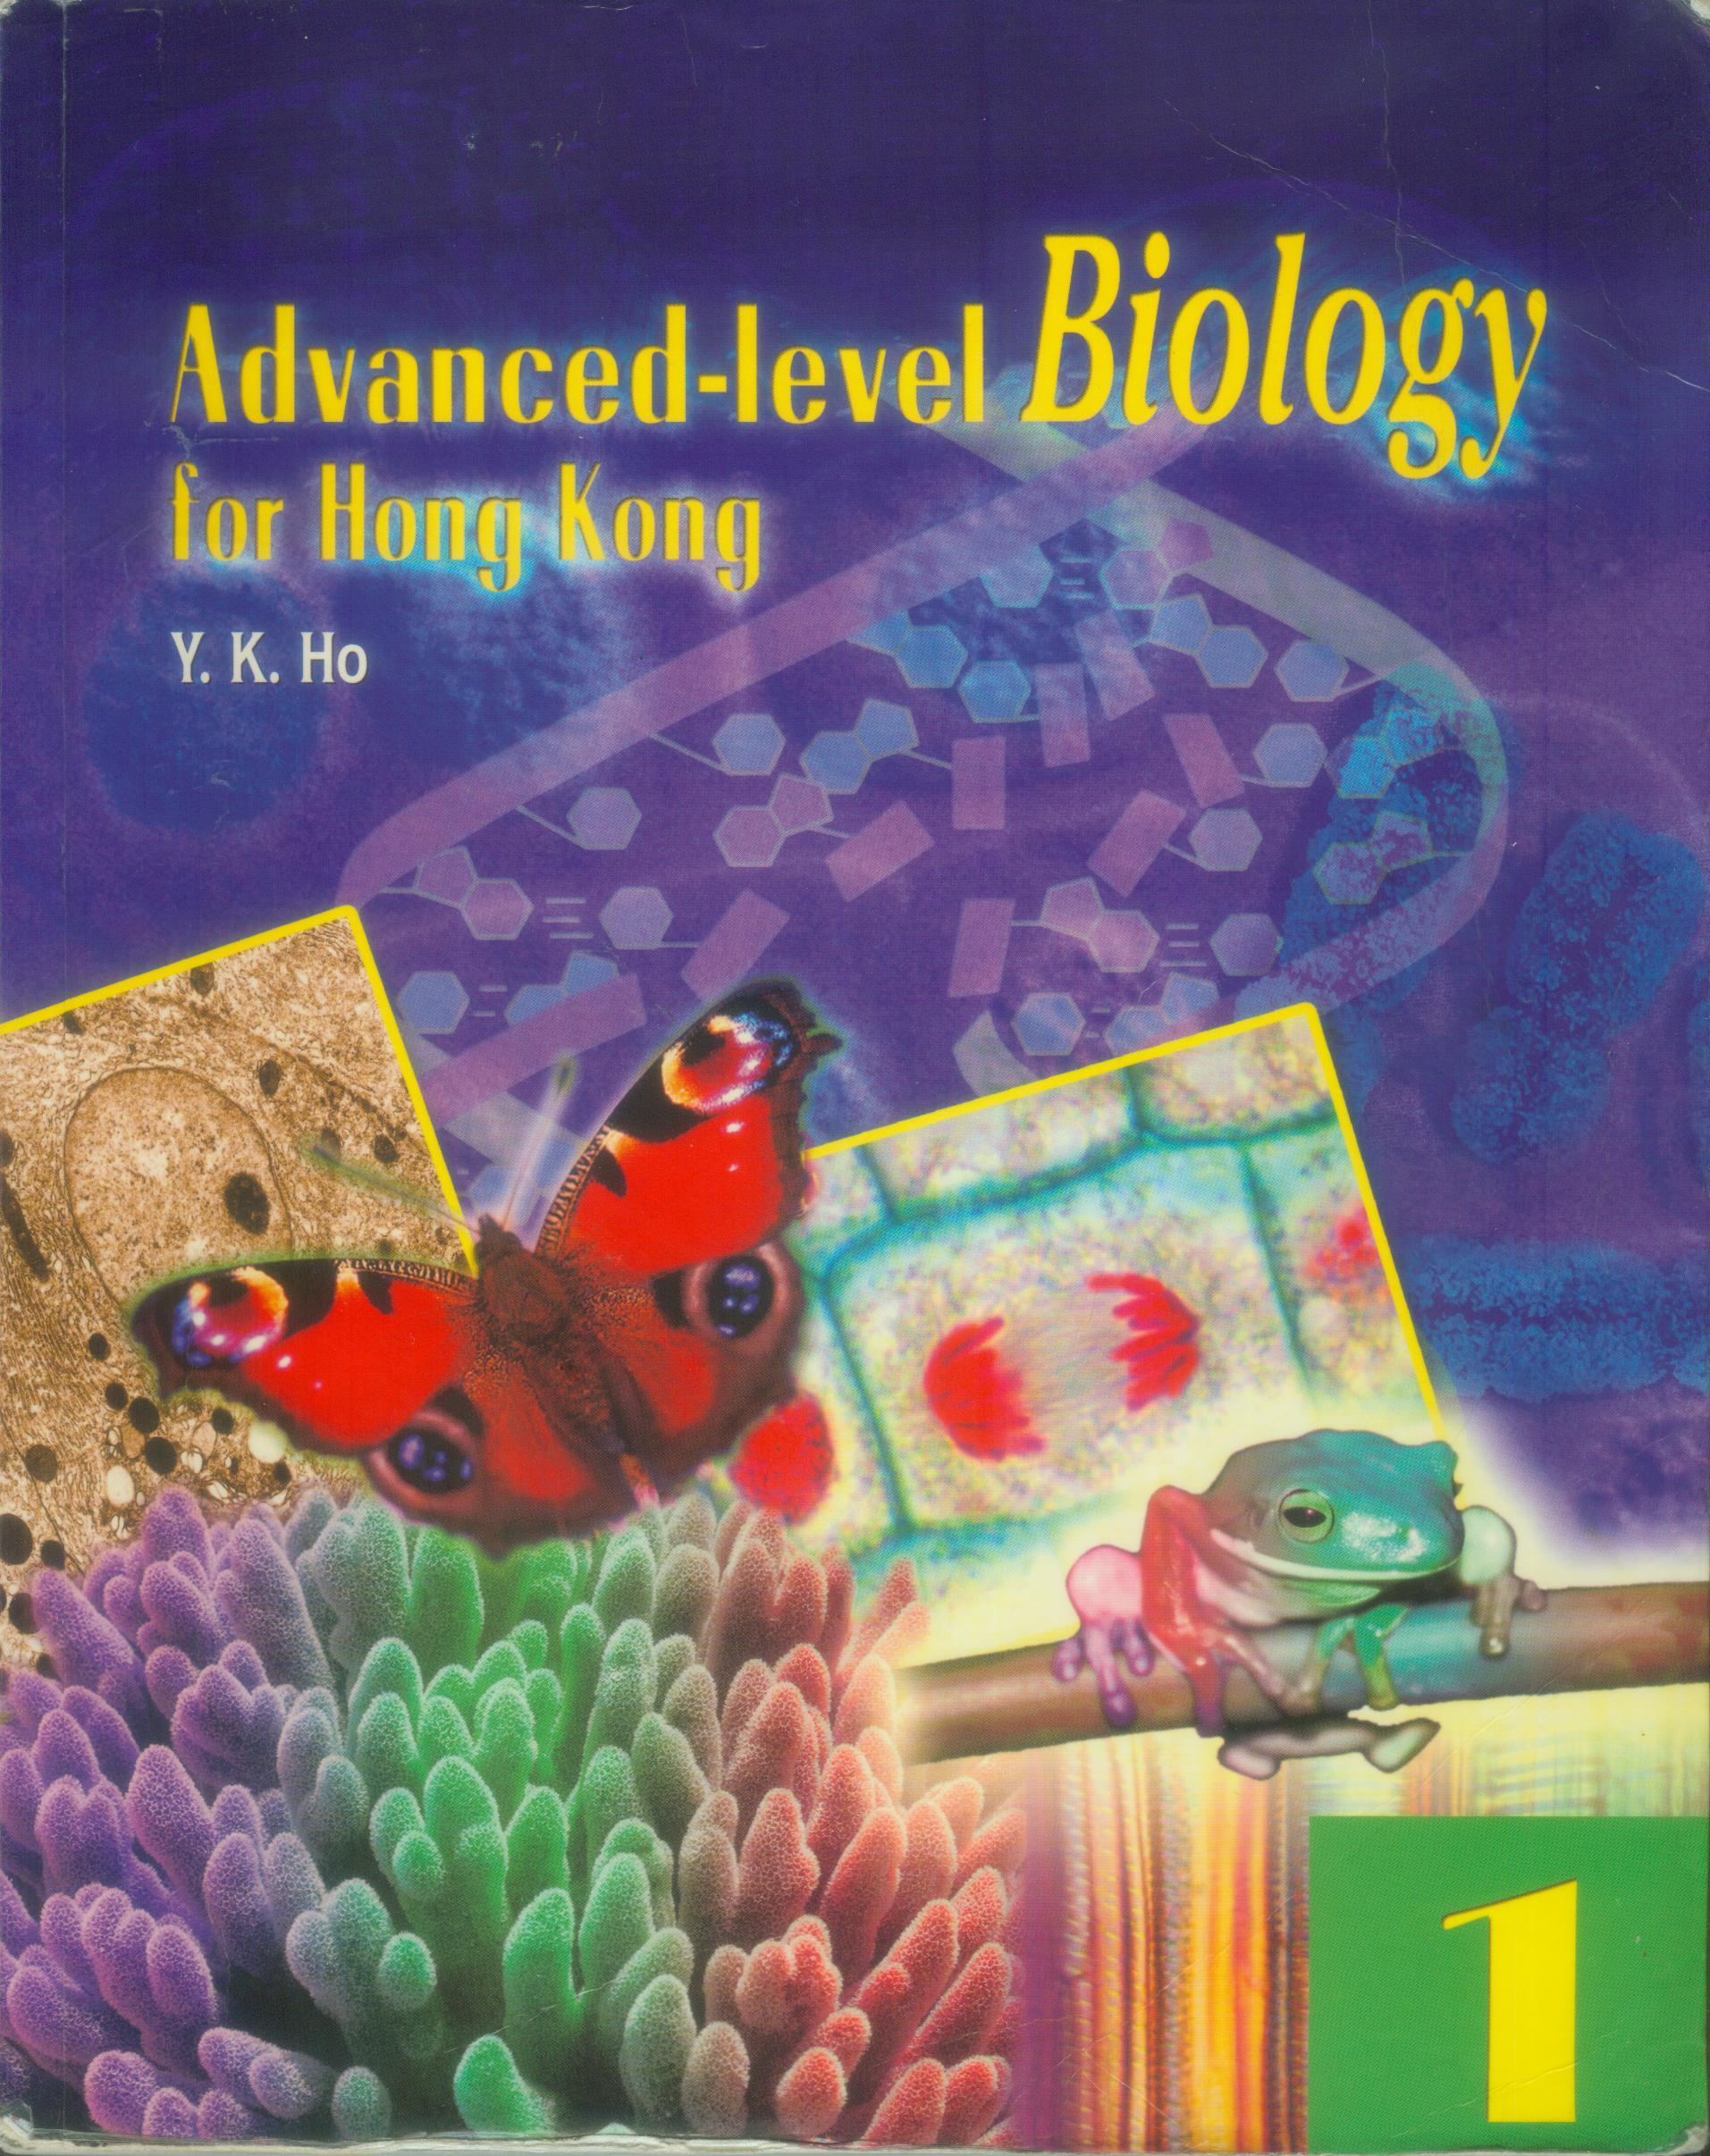 Advanced Level Biology for Hong Kong Volume 1